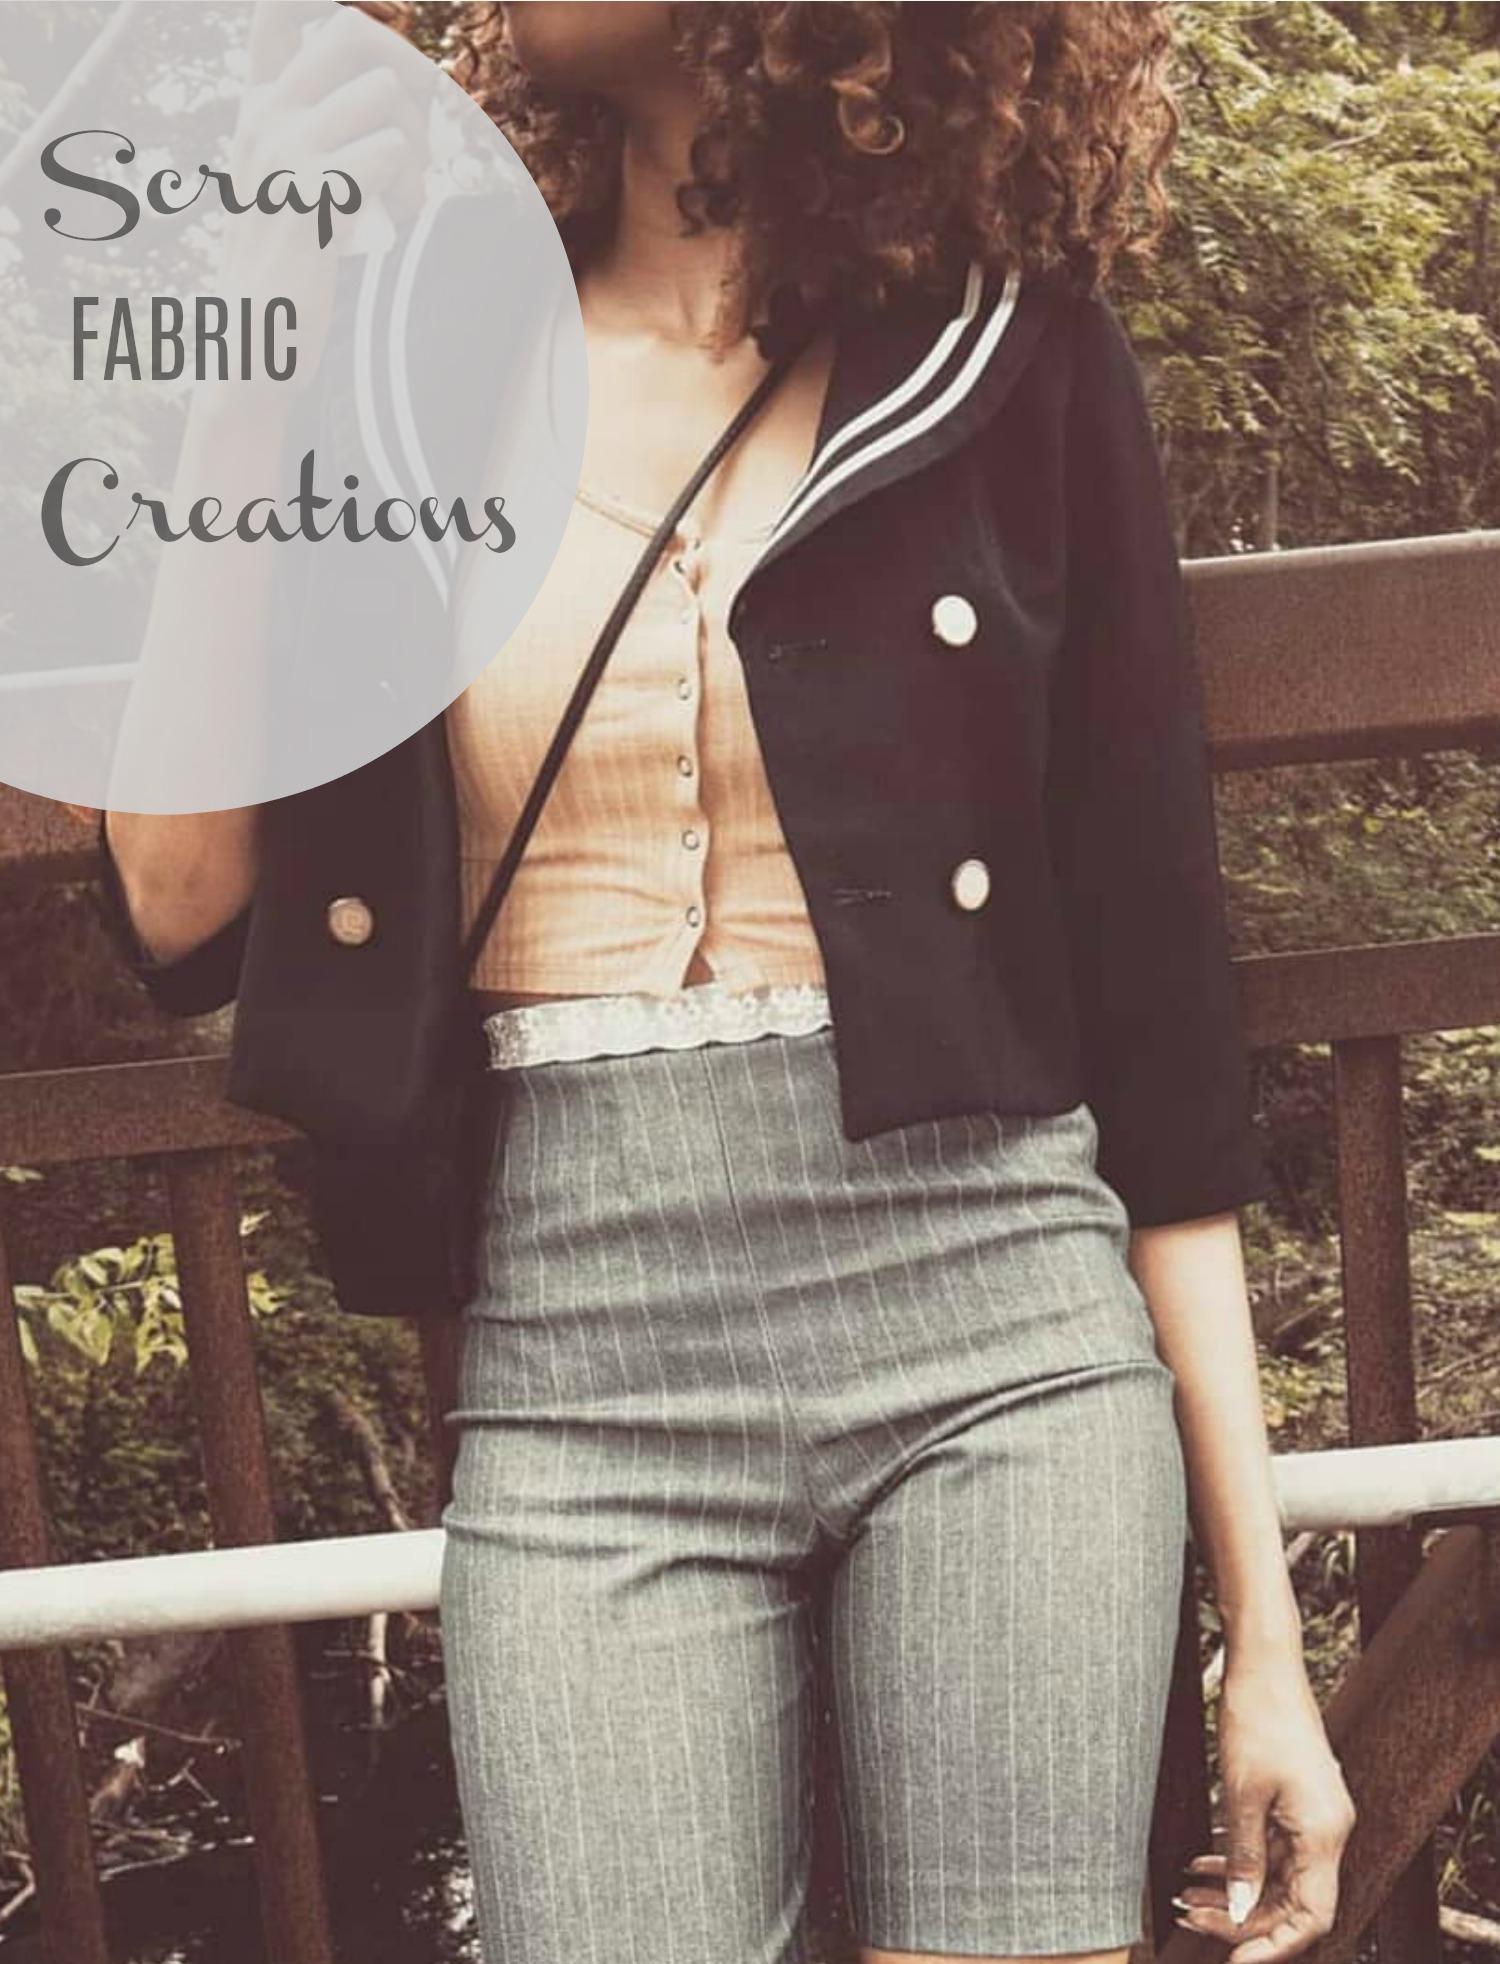 b-fabric-scrap-creations-front-shorts.jpg